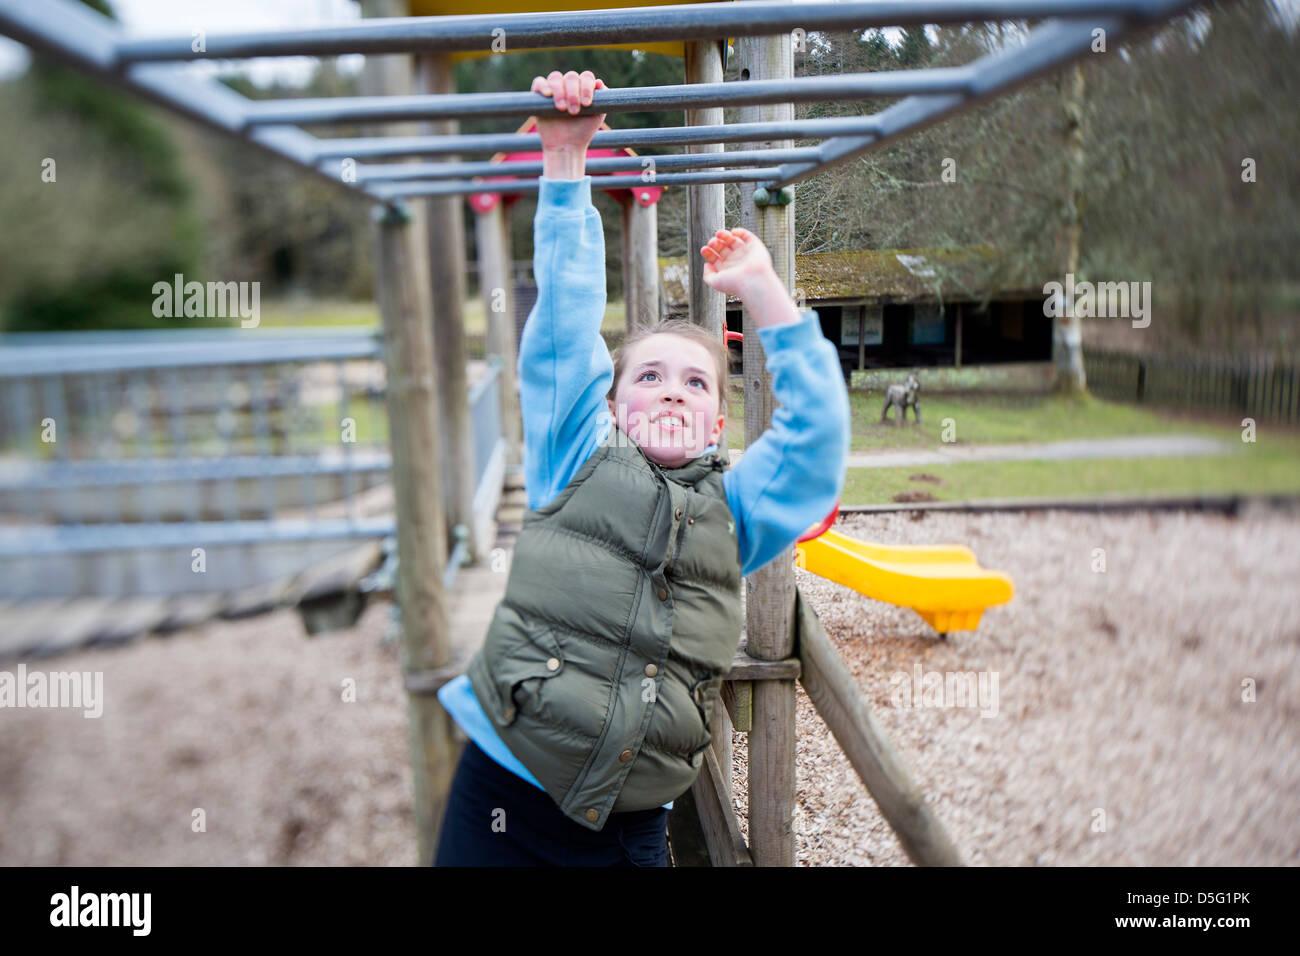 Klettergerüst Clipart : Young girl on monkey bars stockfotos &